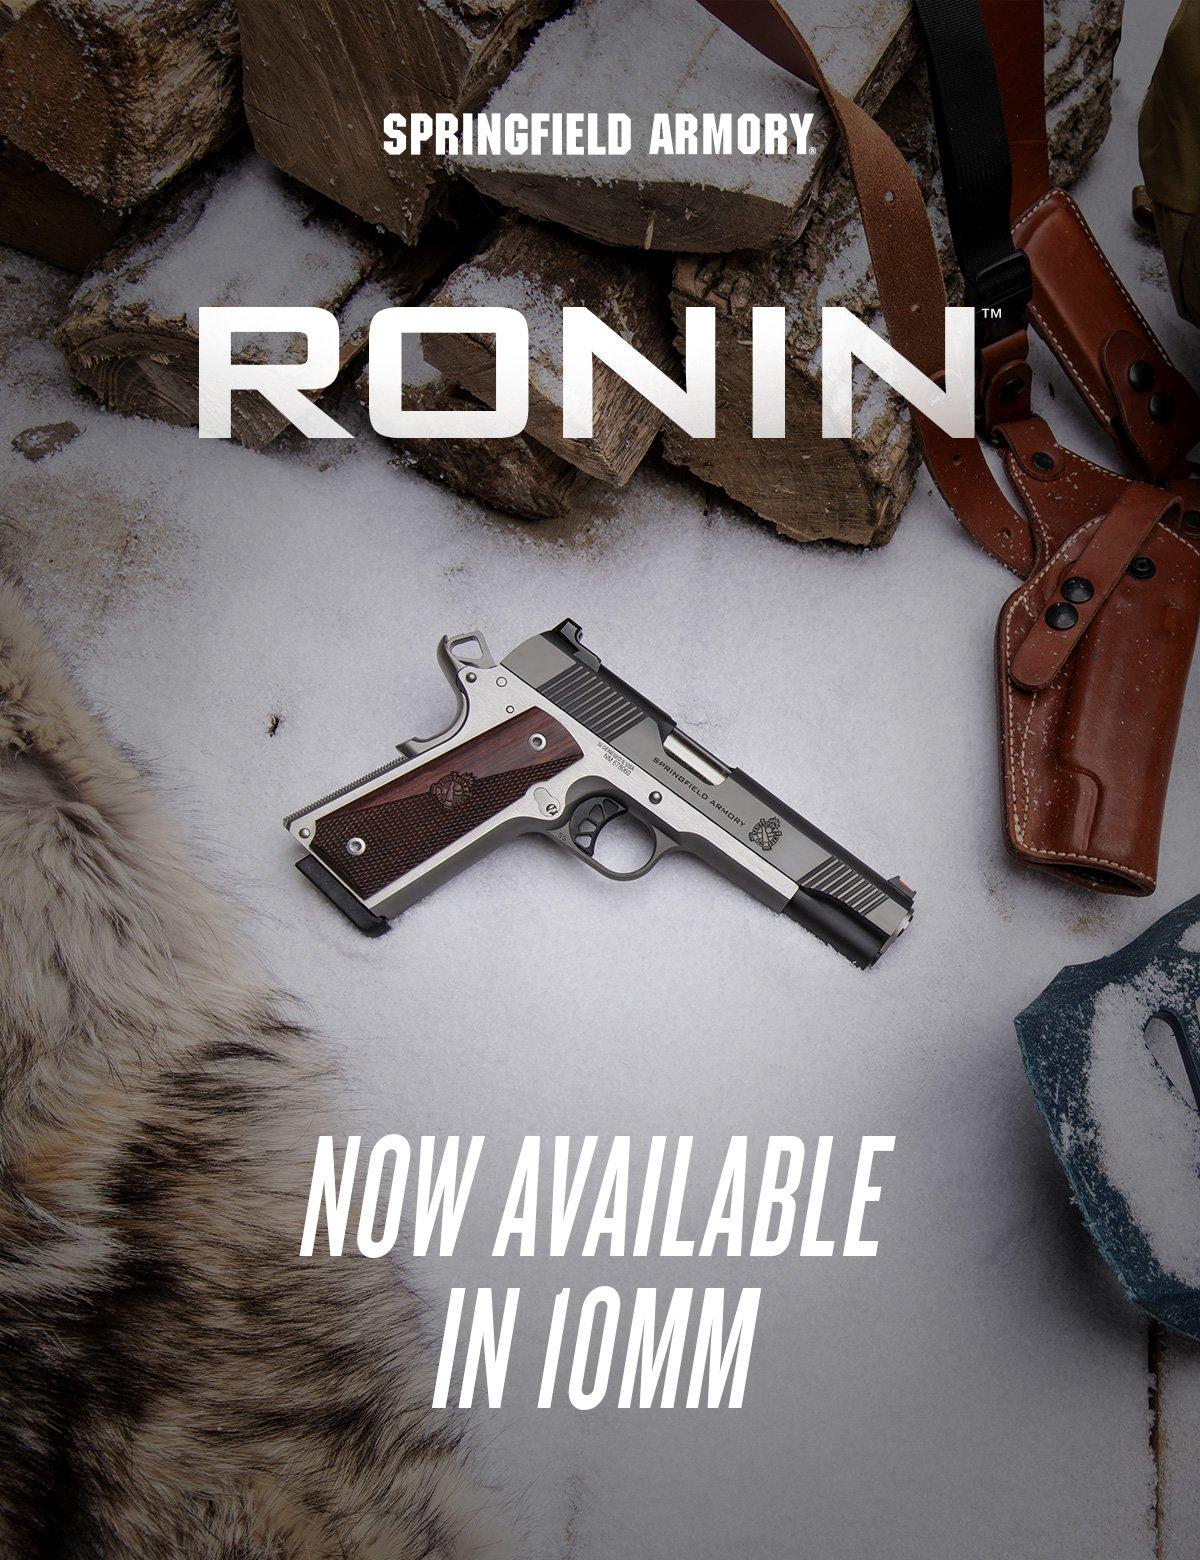 Ronin-10mm-email-header-v1